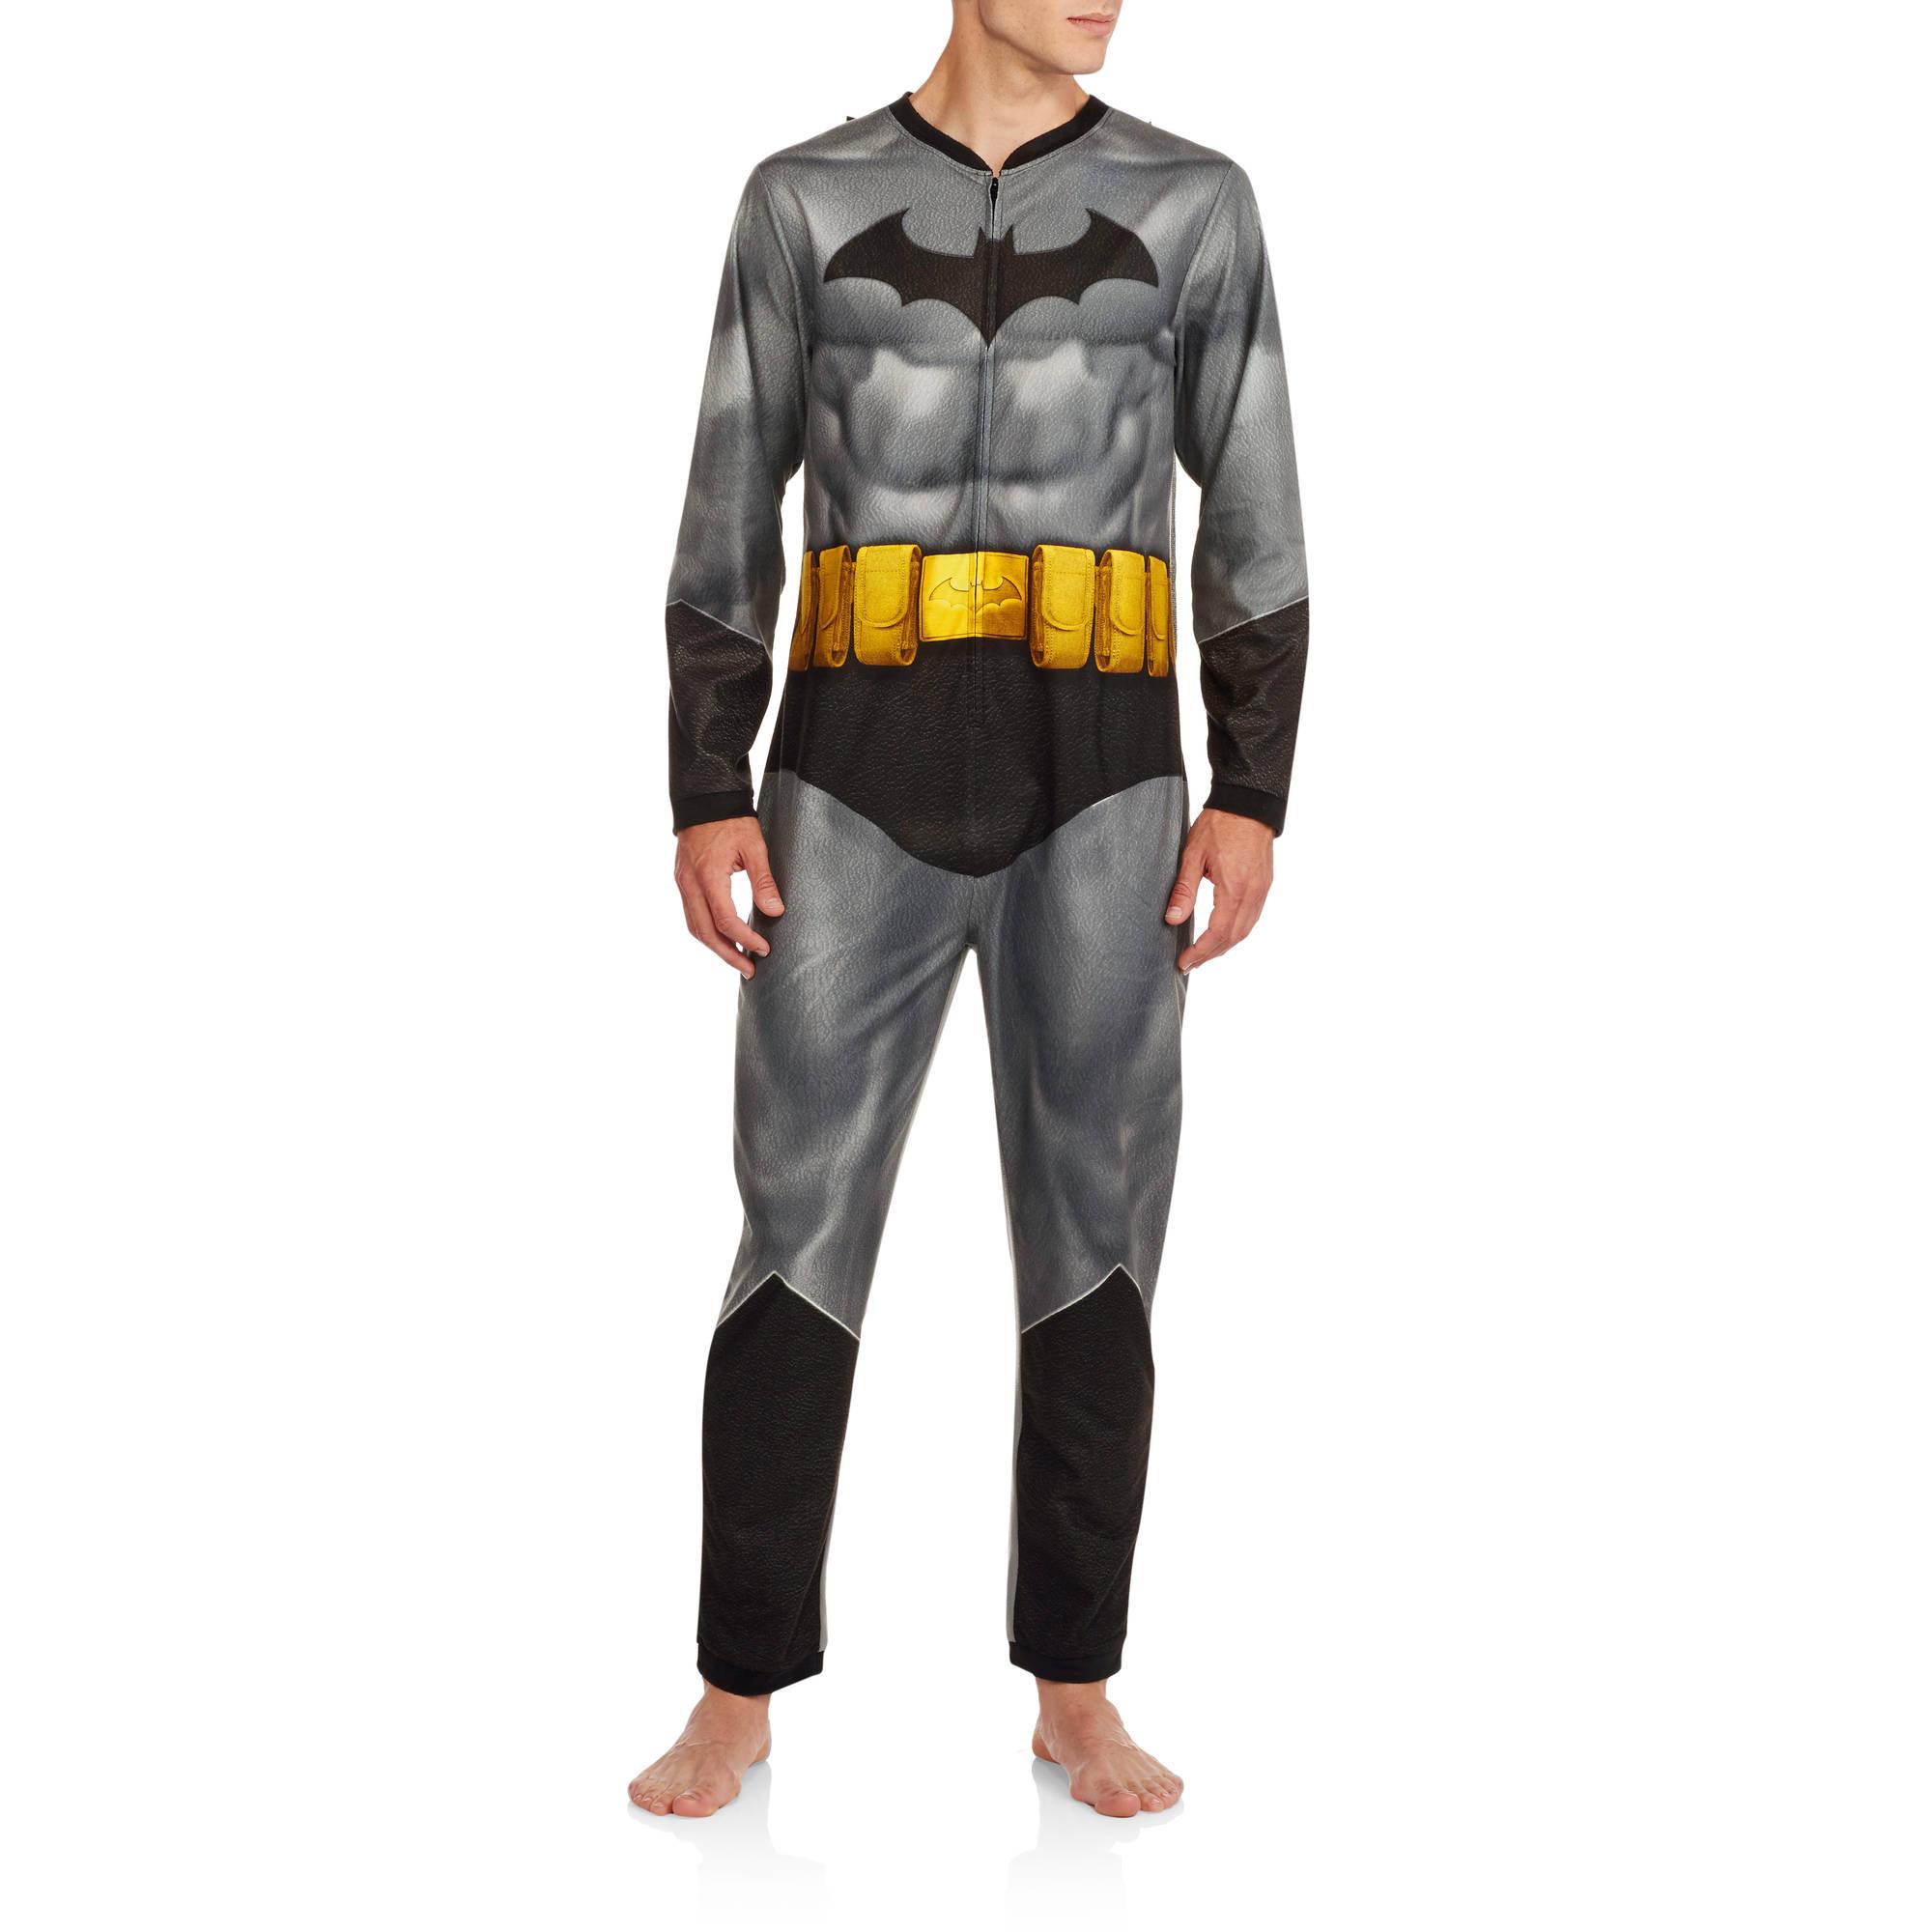 Batman Hooded Onesie | Batman Onesie | Batman Onesie